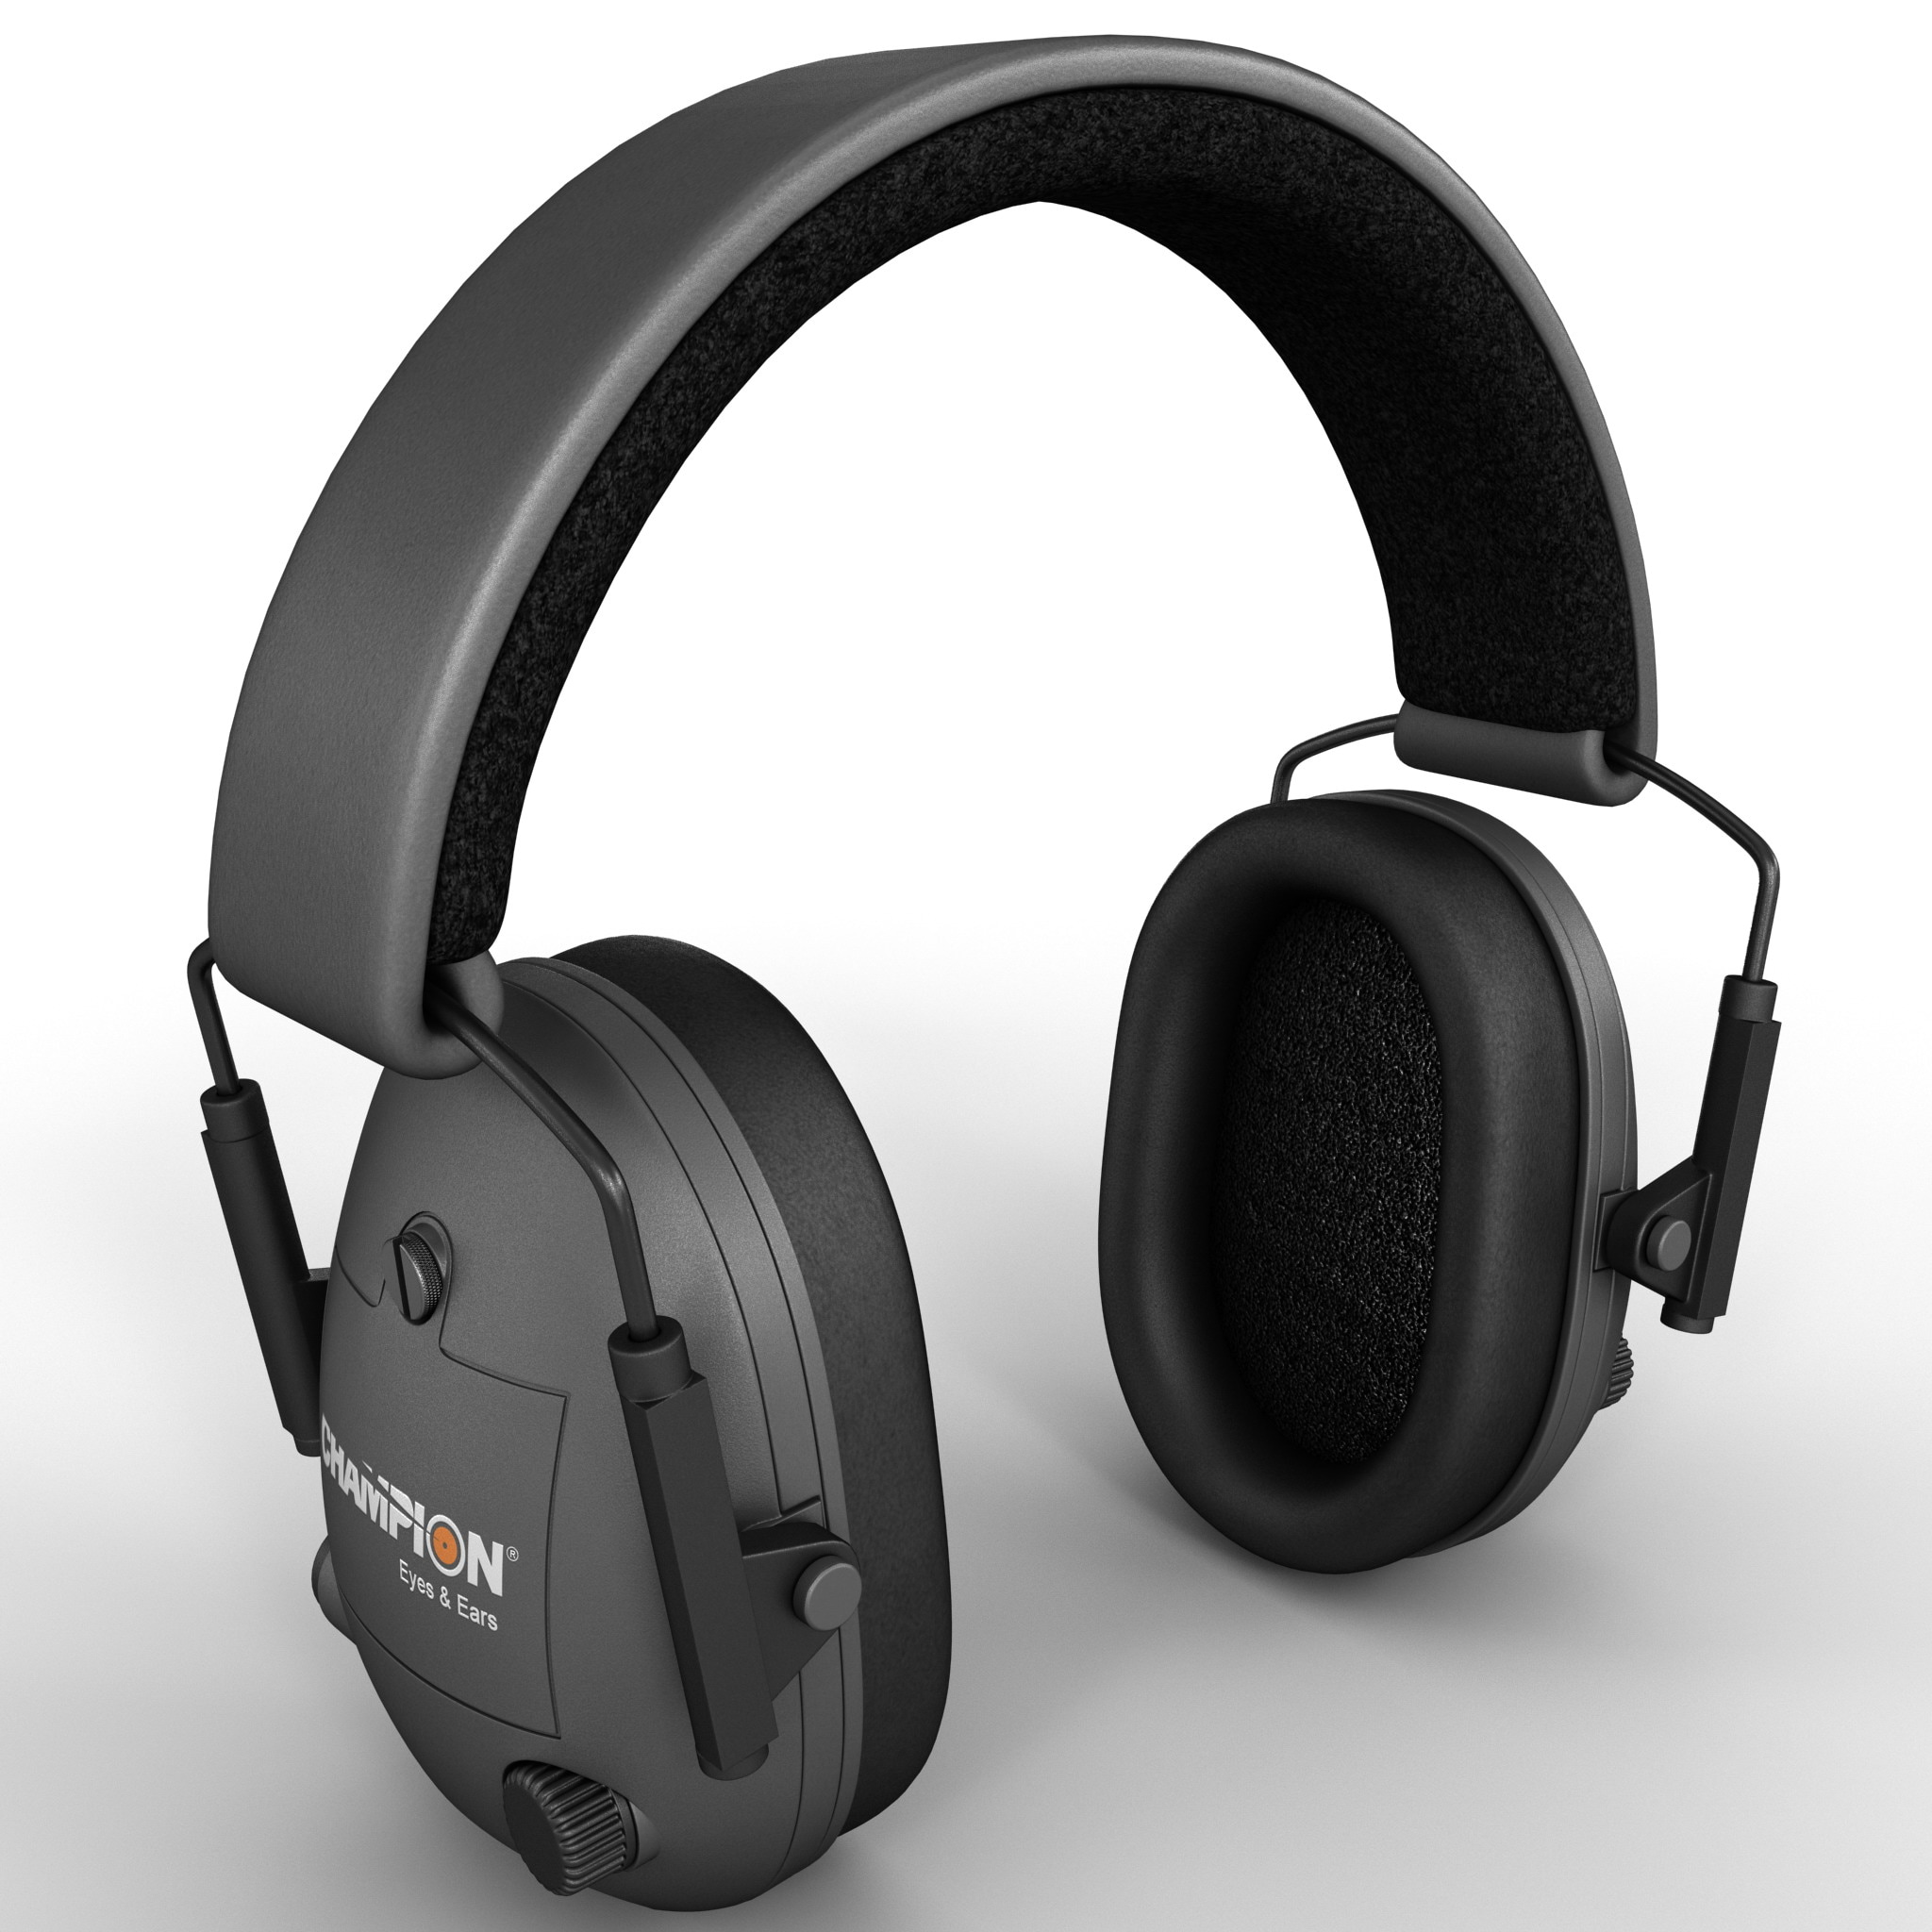 211057_Electronic_Ear_Muffs_001.jpg